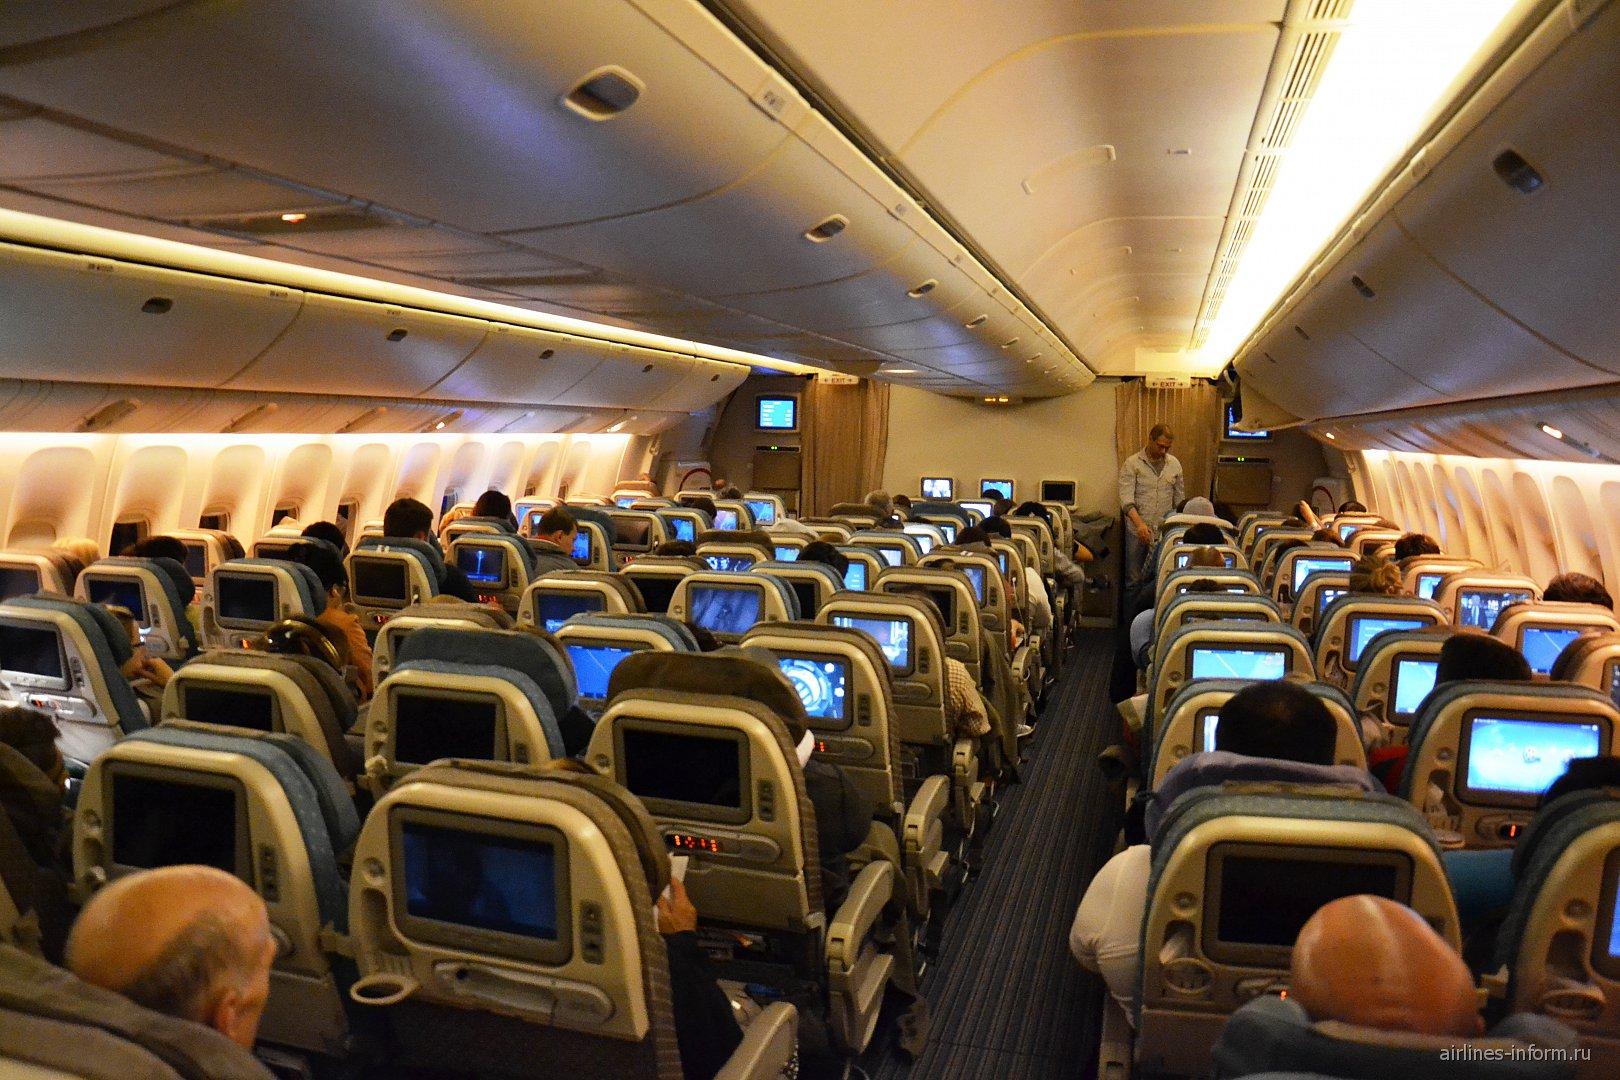 В салоне эконом-класса самолета Боинг-777-300 Сингапурских авиалиний